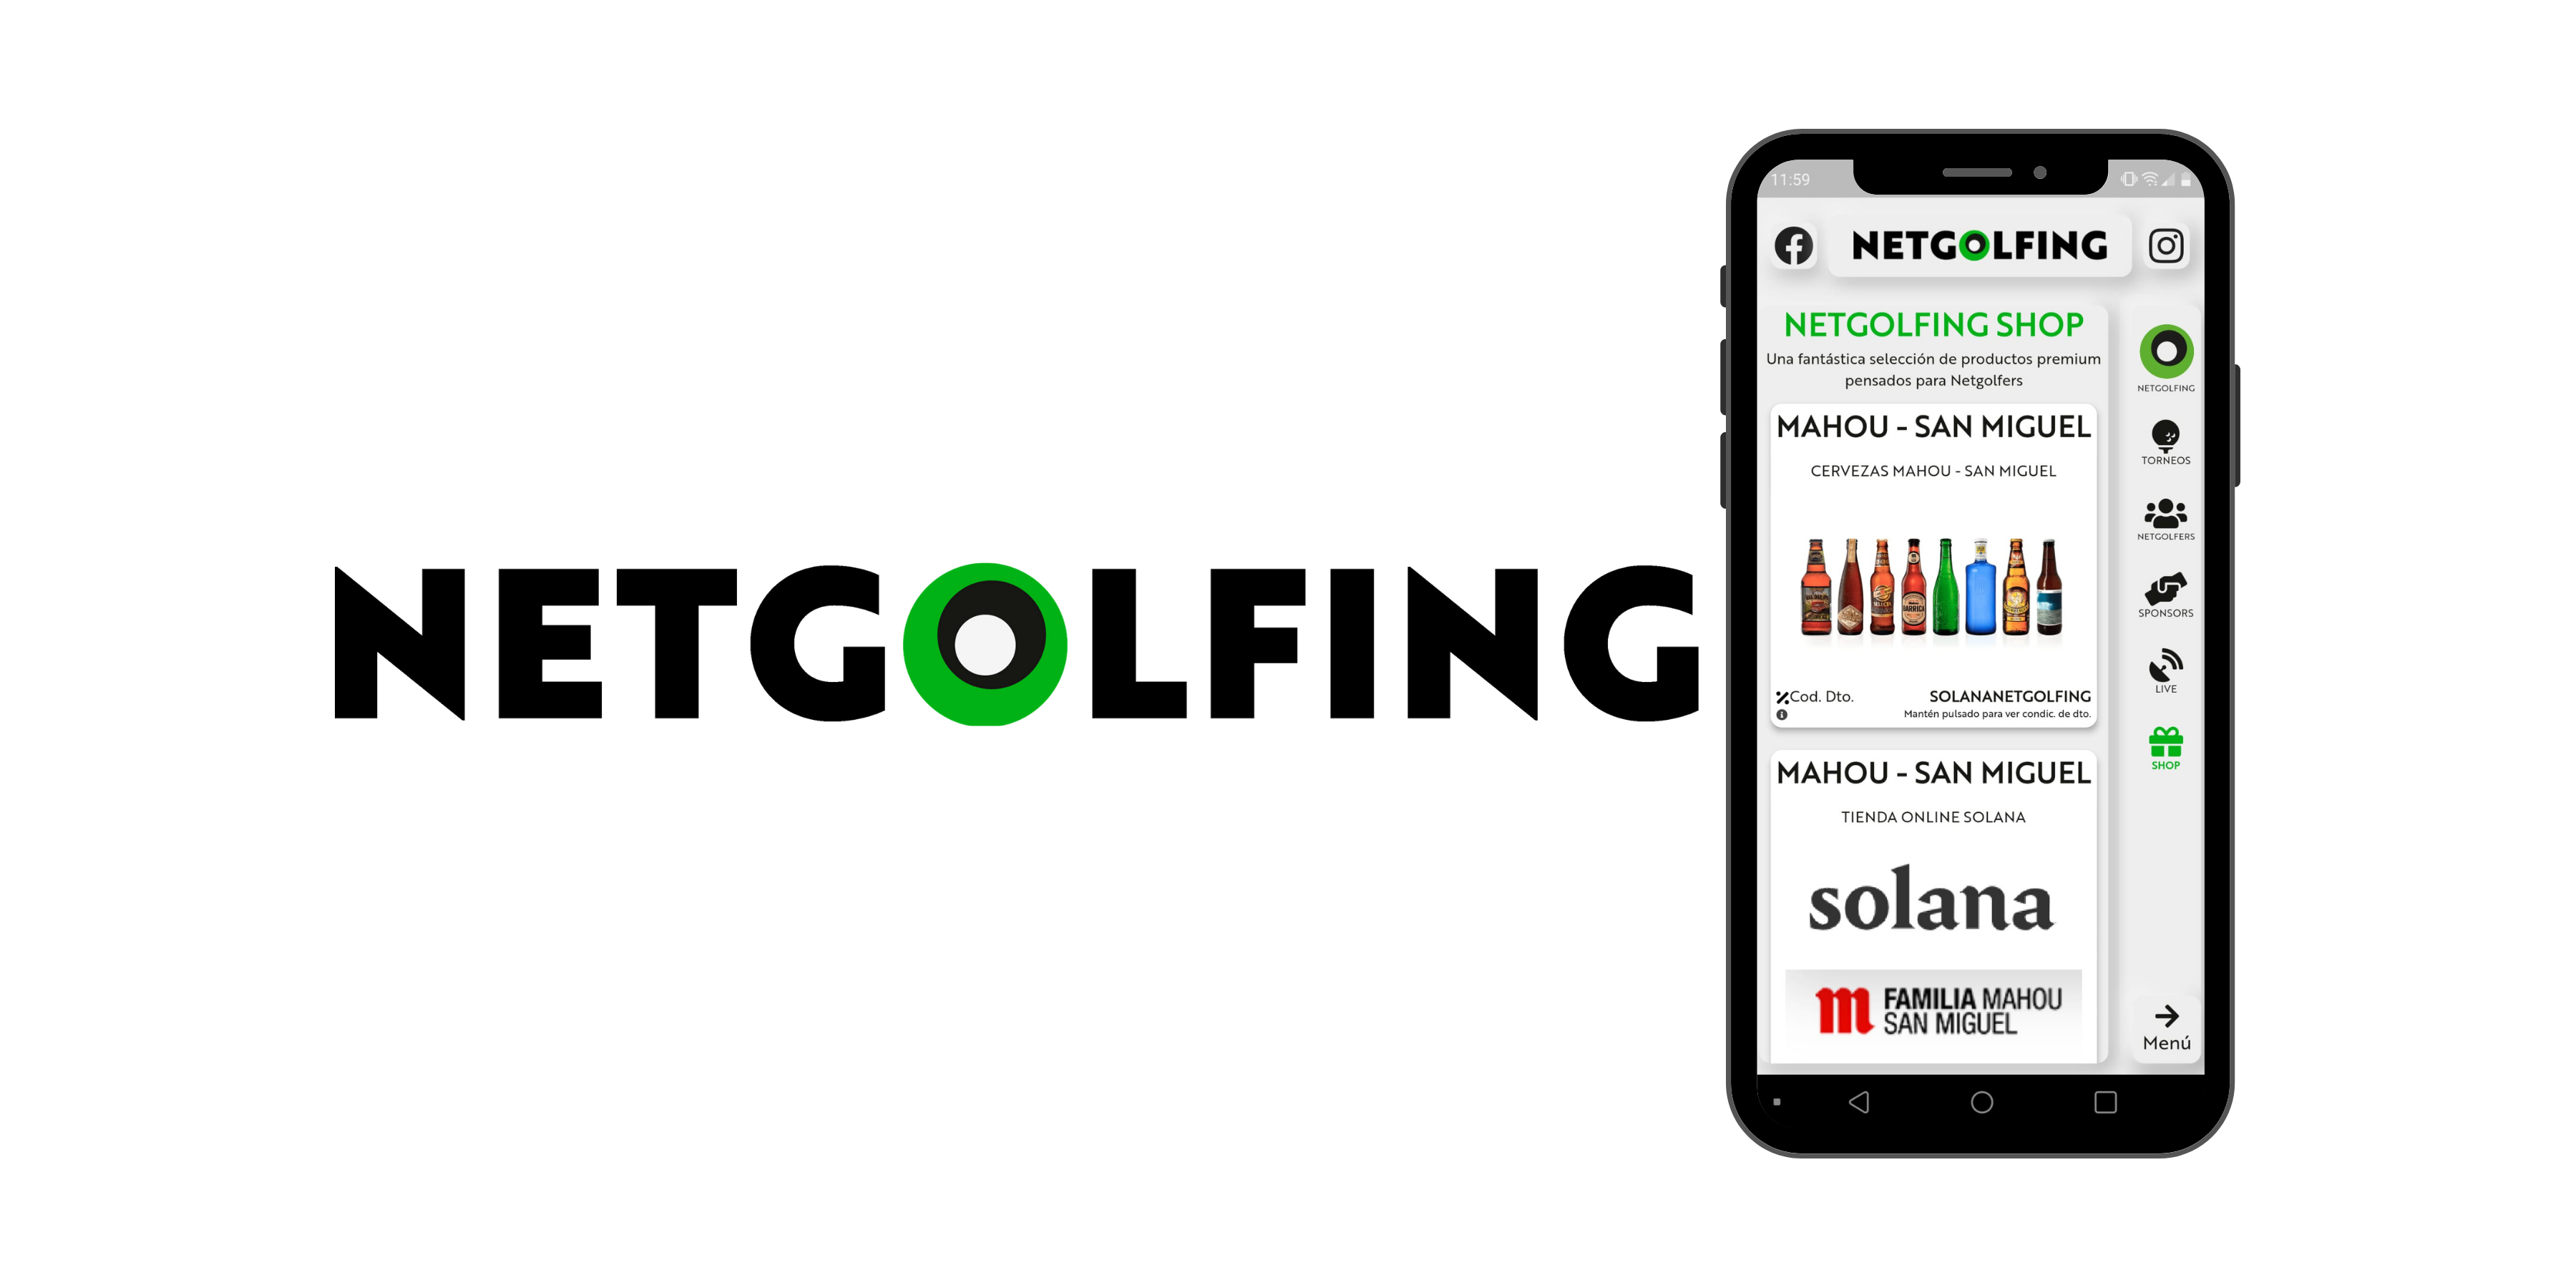 Netgolfing